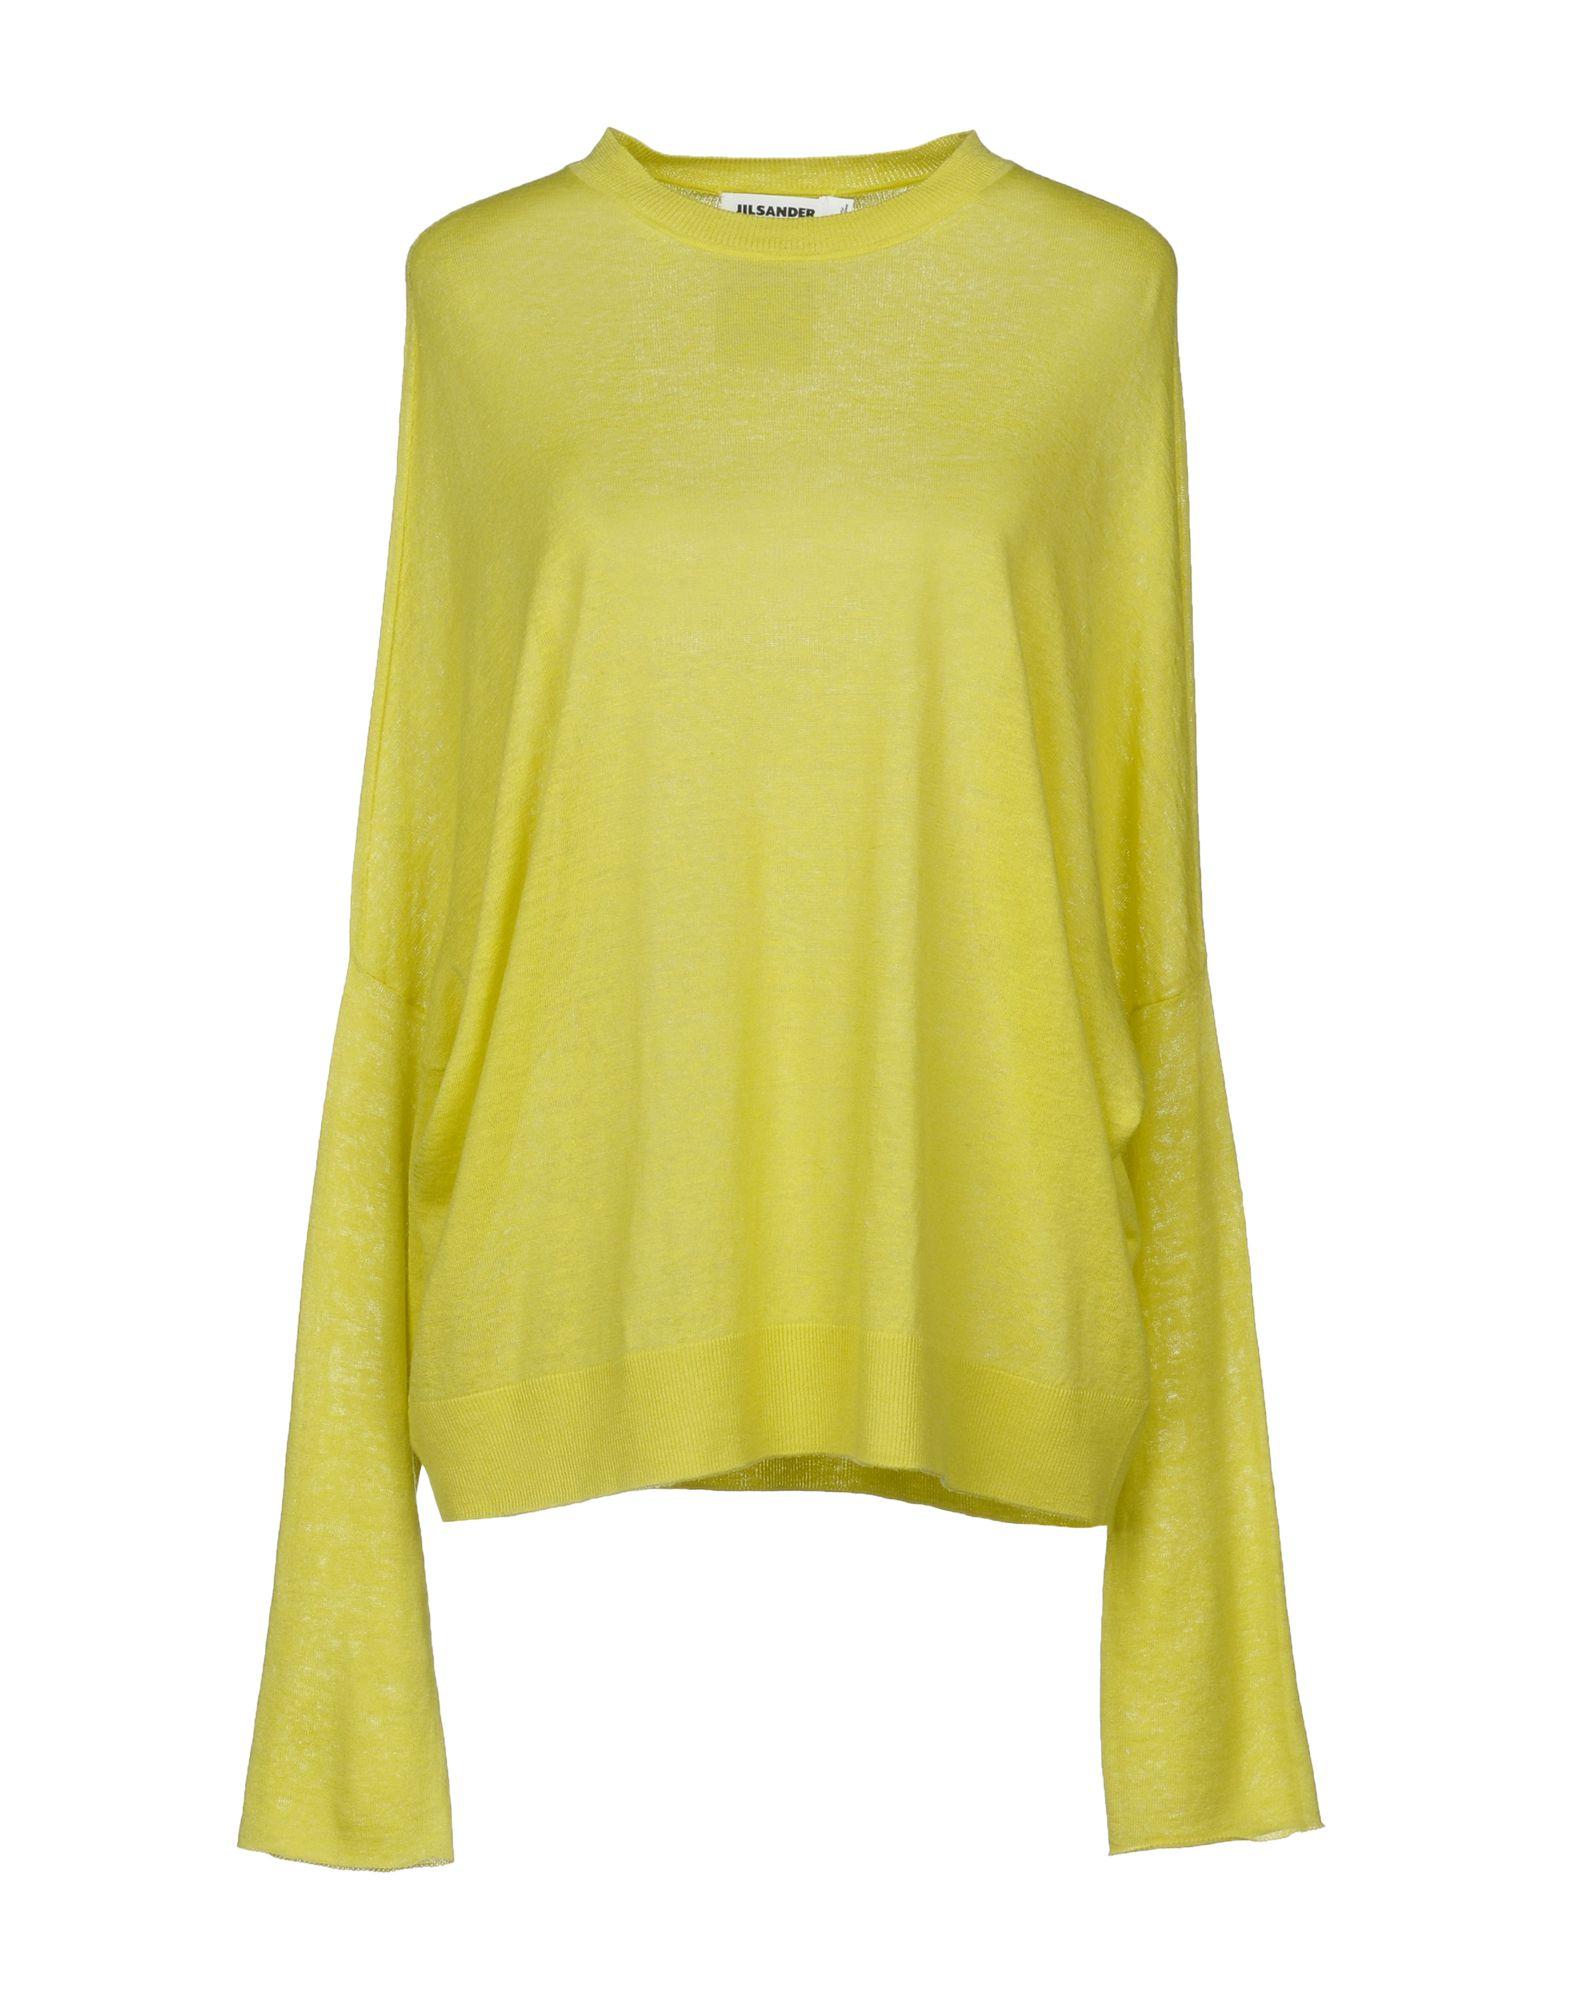 Jil Sander Sweater In Yellow